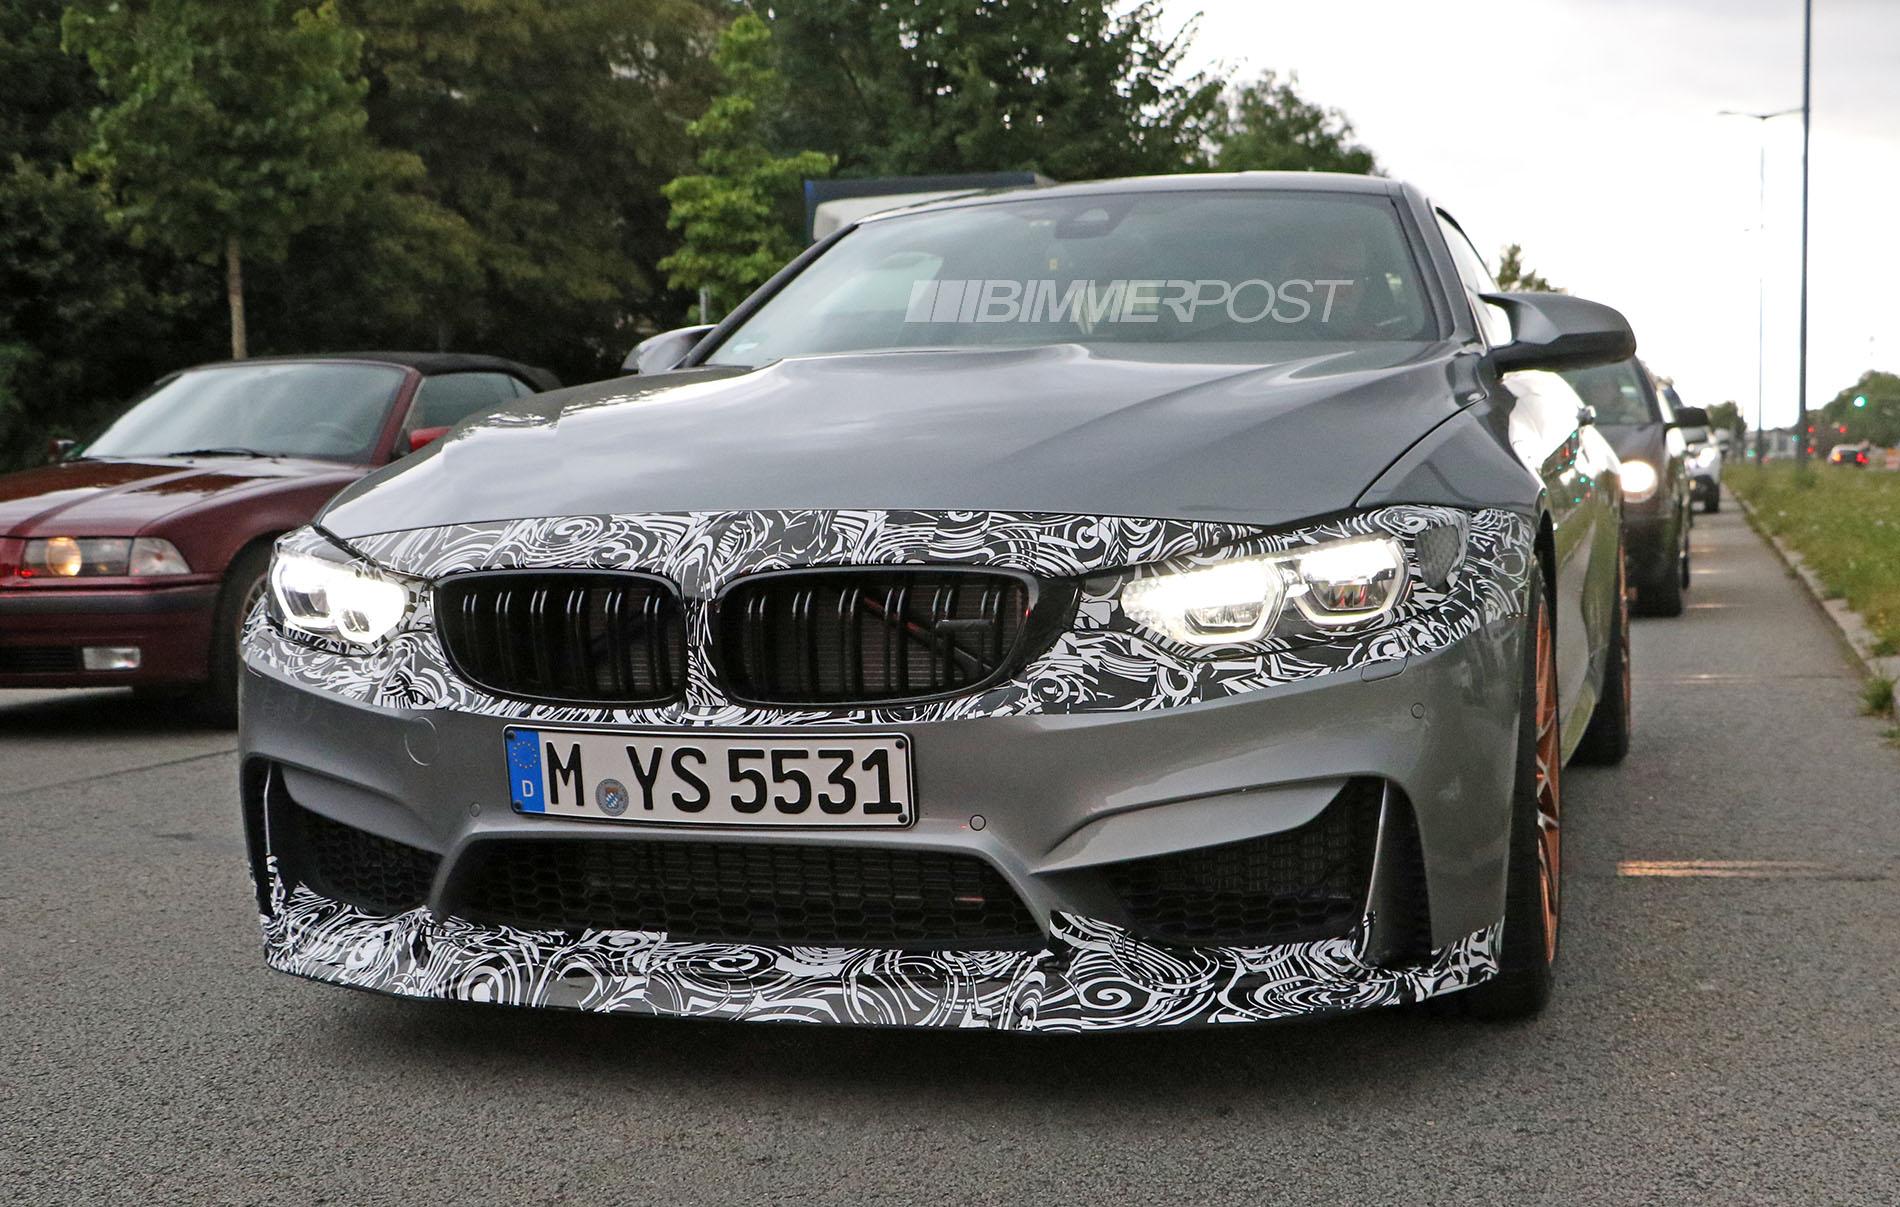 2014 - [BMW] M3 & M4 [F80/F82/F83] - Page 23 BMW%20M4%20facelift%201